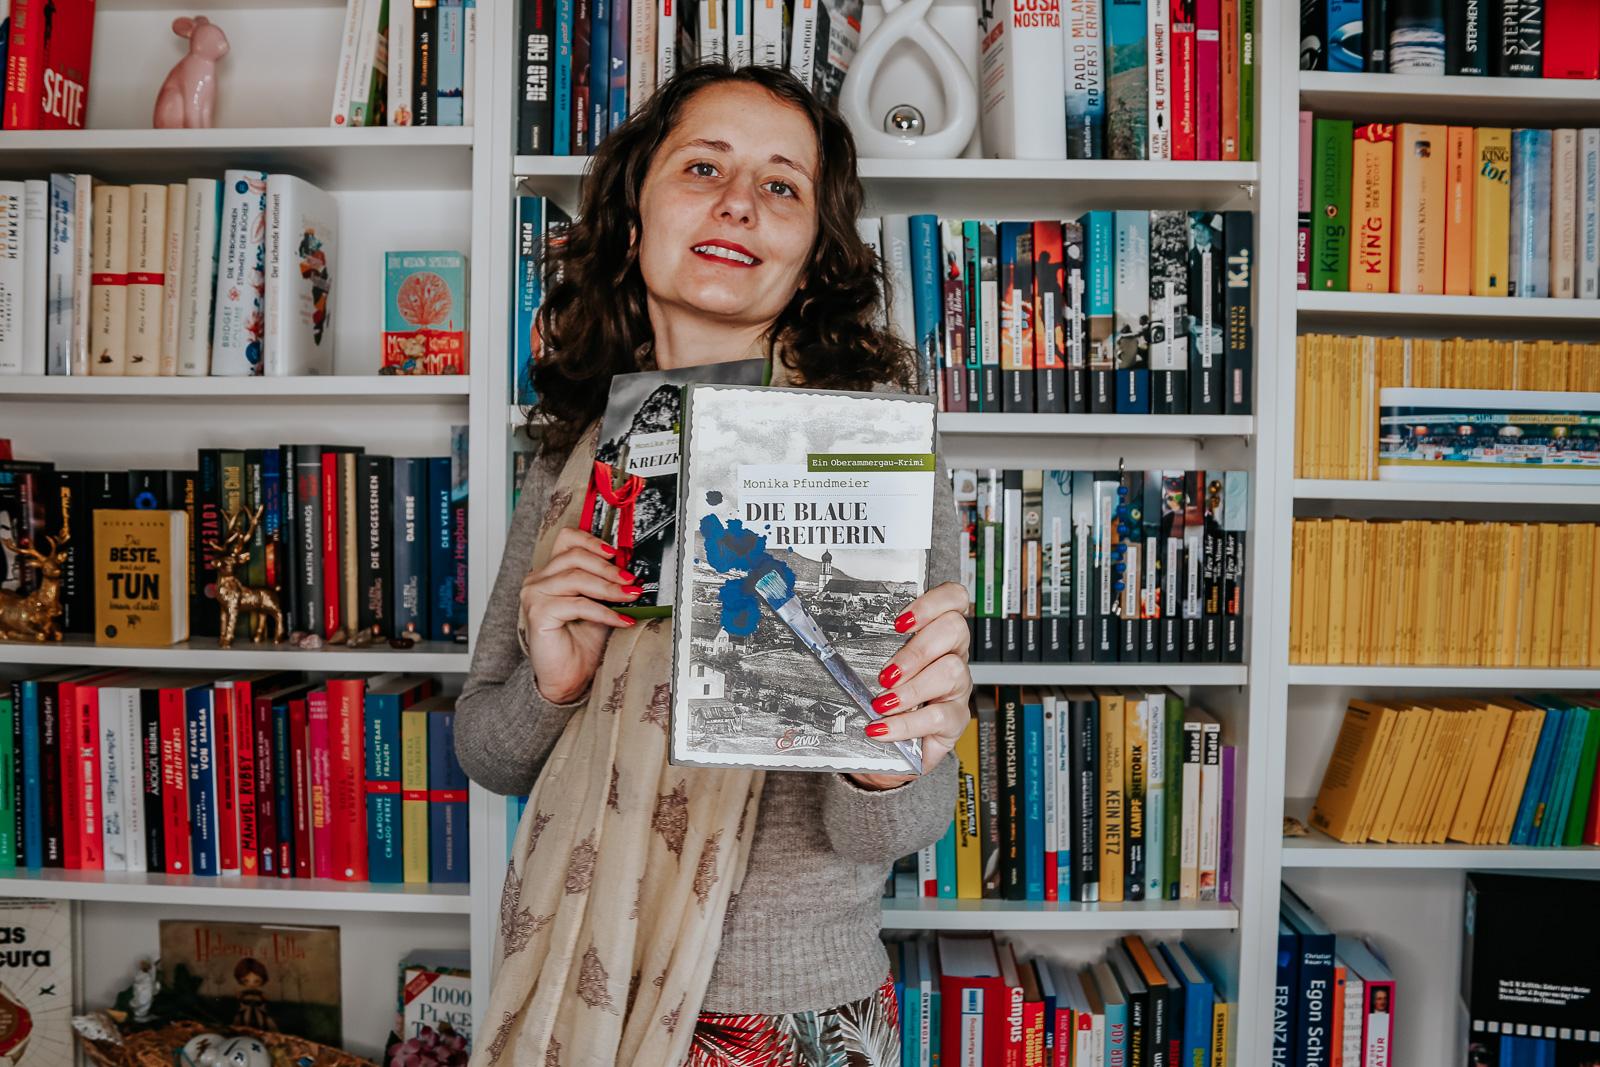 Die blaue Reiterin - Monika Pfundmeier